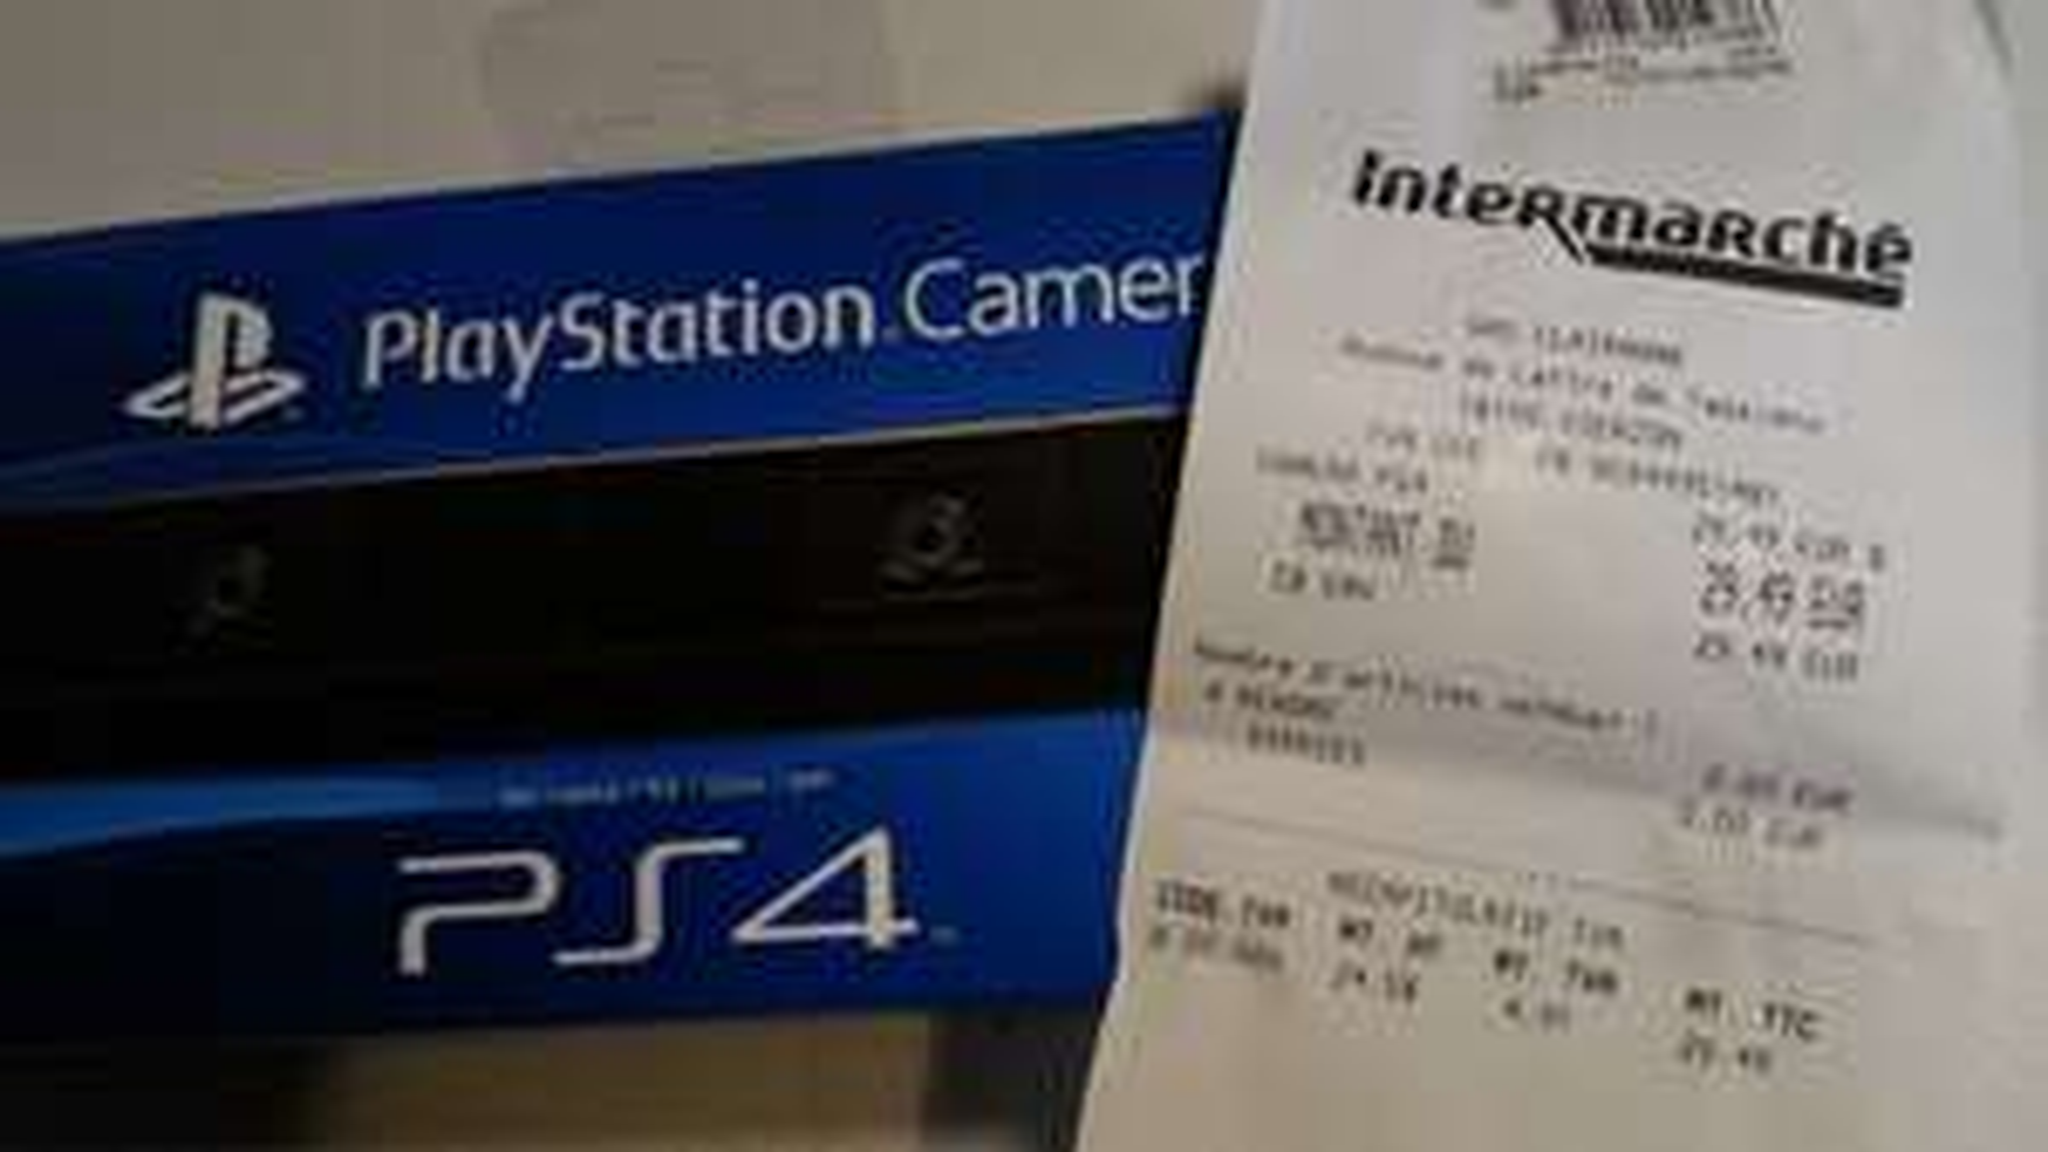 Accessoire Sony PlayStation Camera (V1) au Intermarché Vierzon (18)